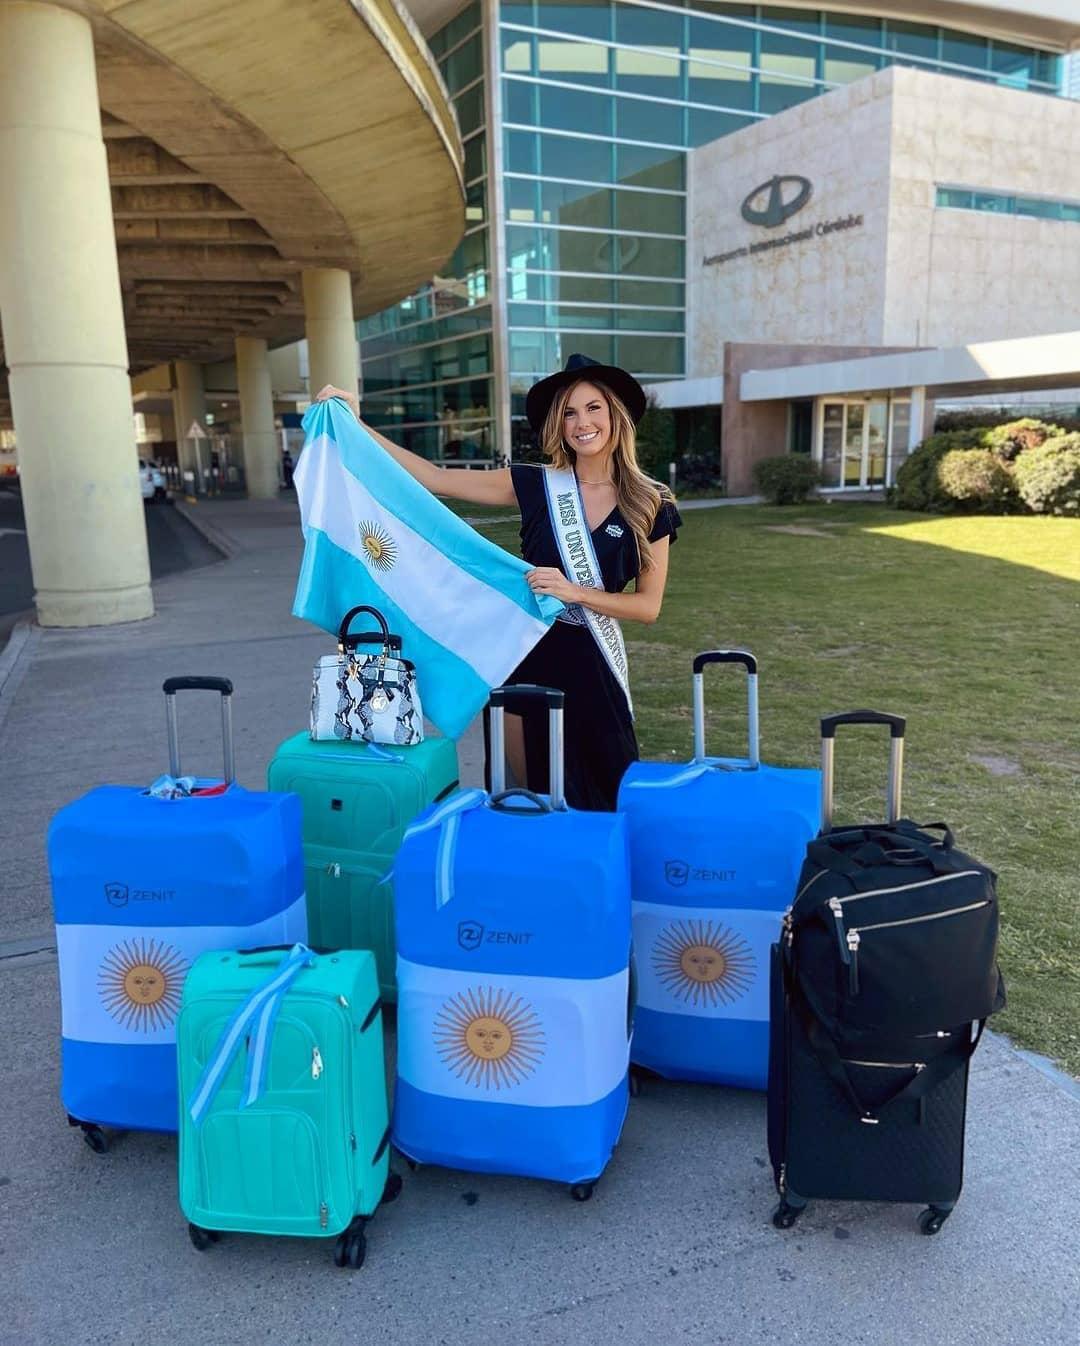 alina akselrad, miss argentina universo 2020. - Página 8 20450510